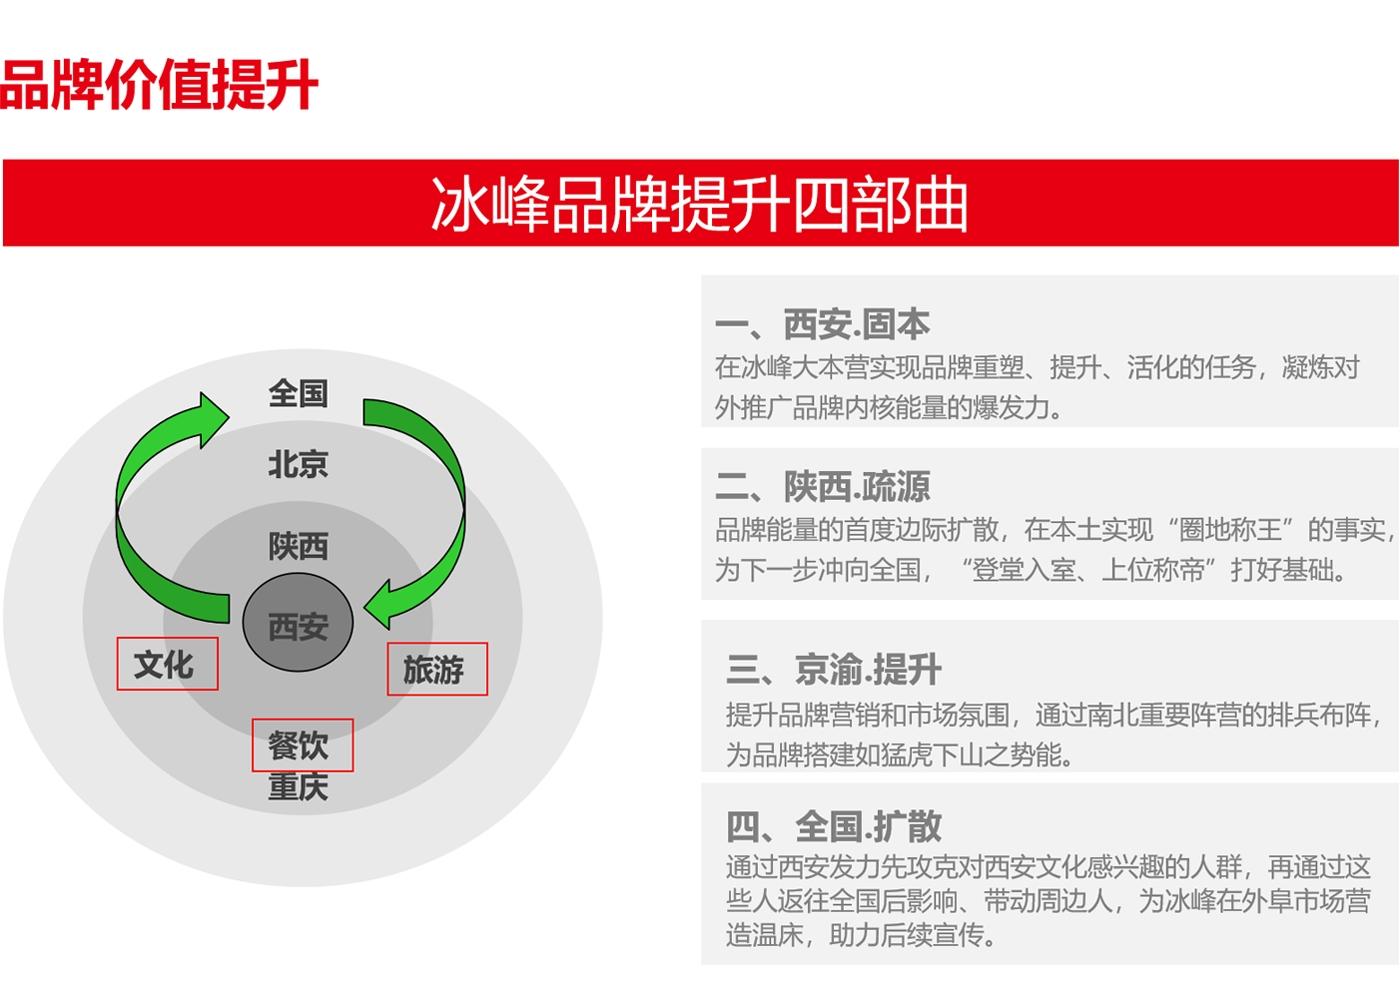 西安冰峰<a href='http://www.6bubu.com/' title='' style='color:;font-weight:bold'>品牌設計</a>04.jpg